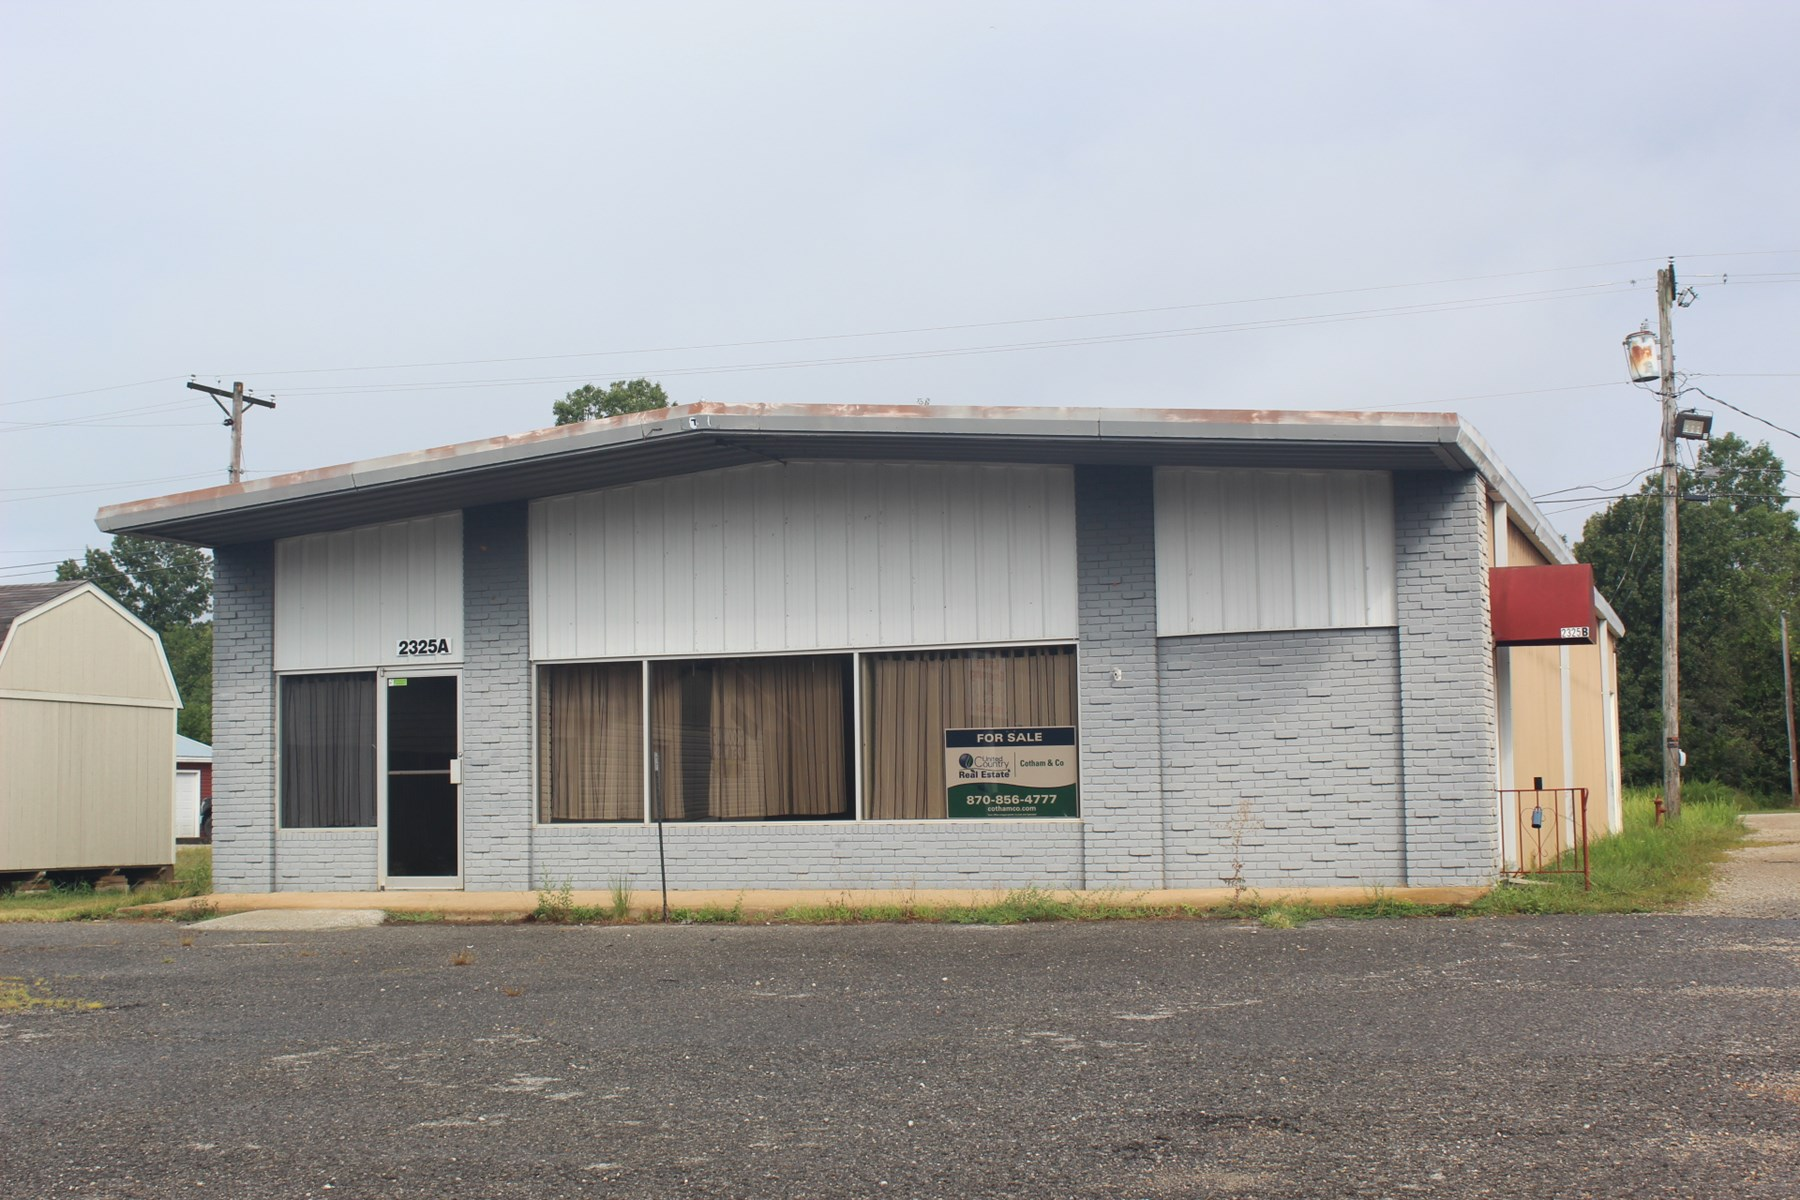 Commercial building under 100k for sale in Highland, AR